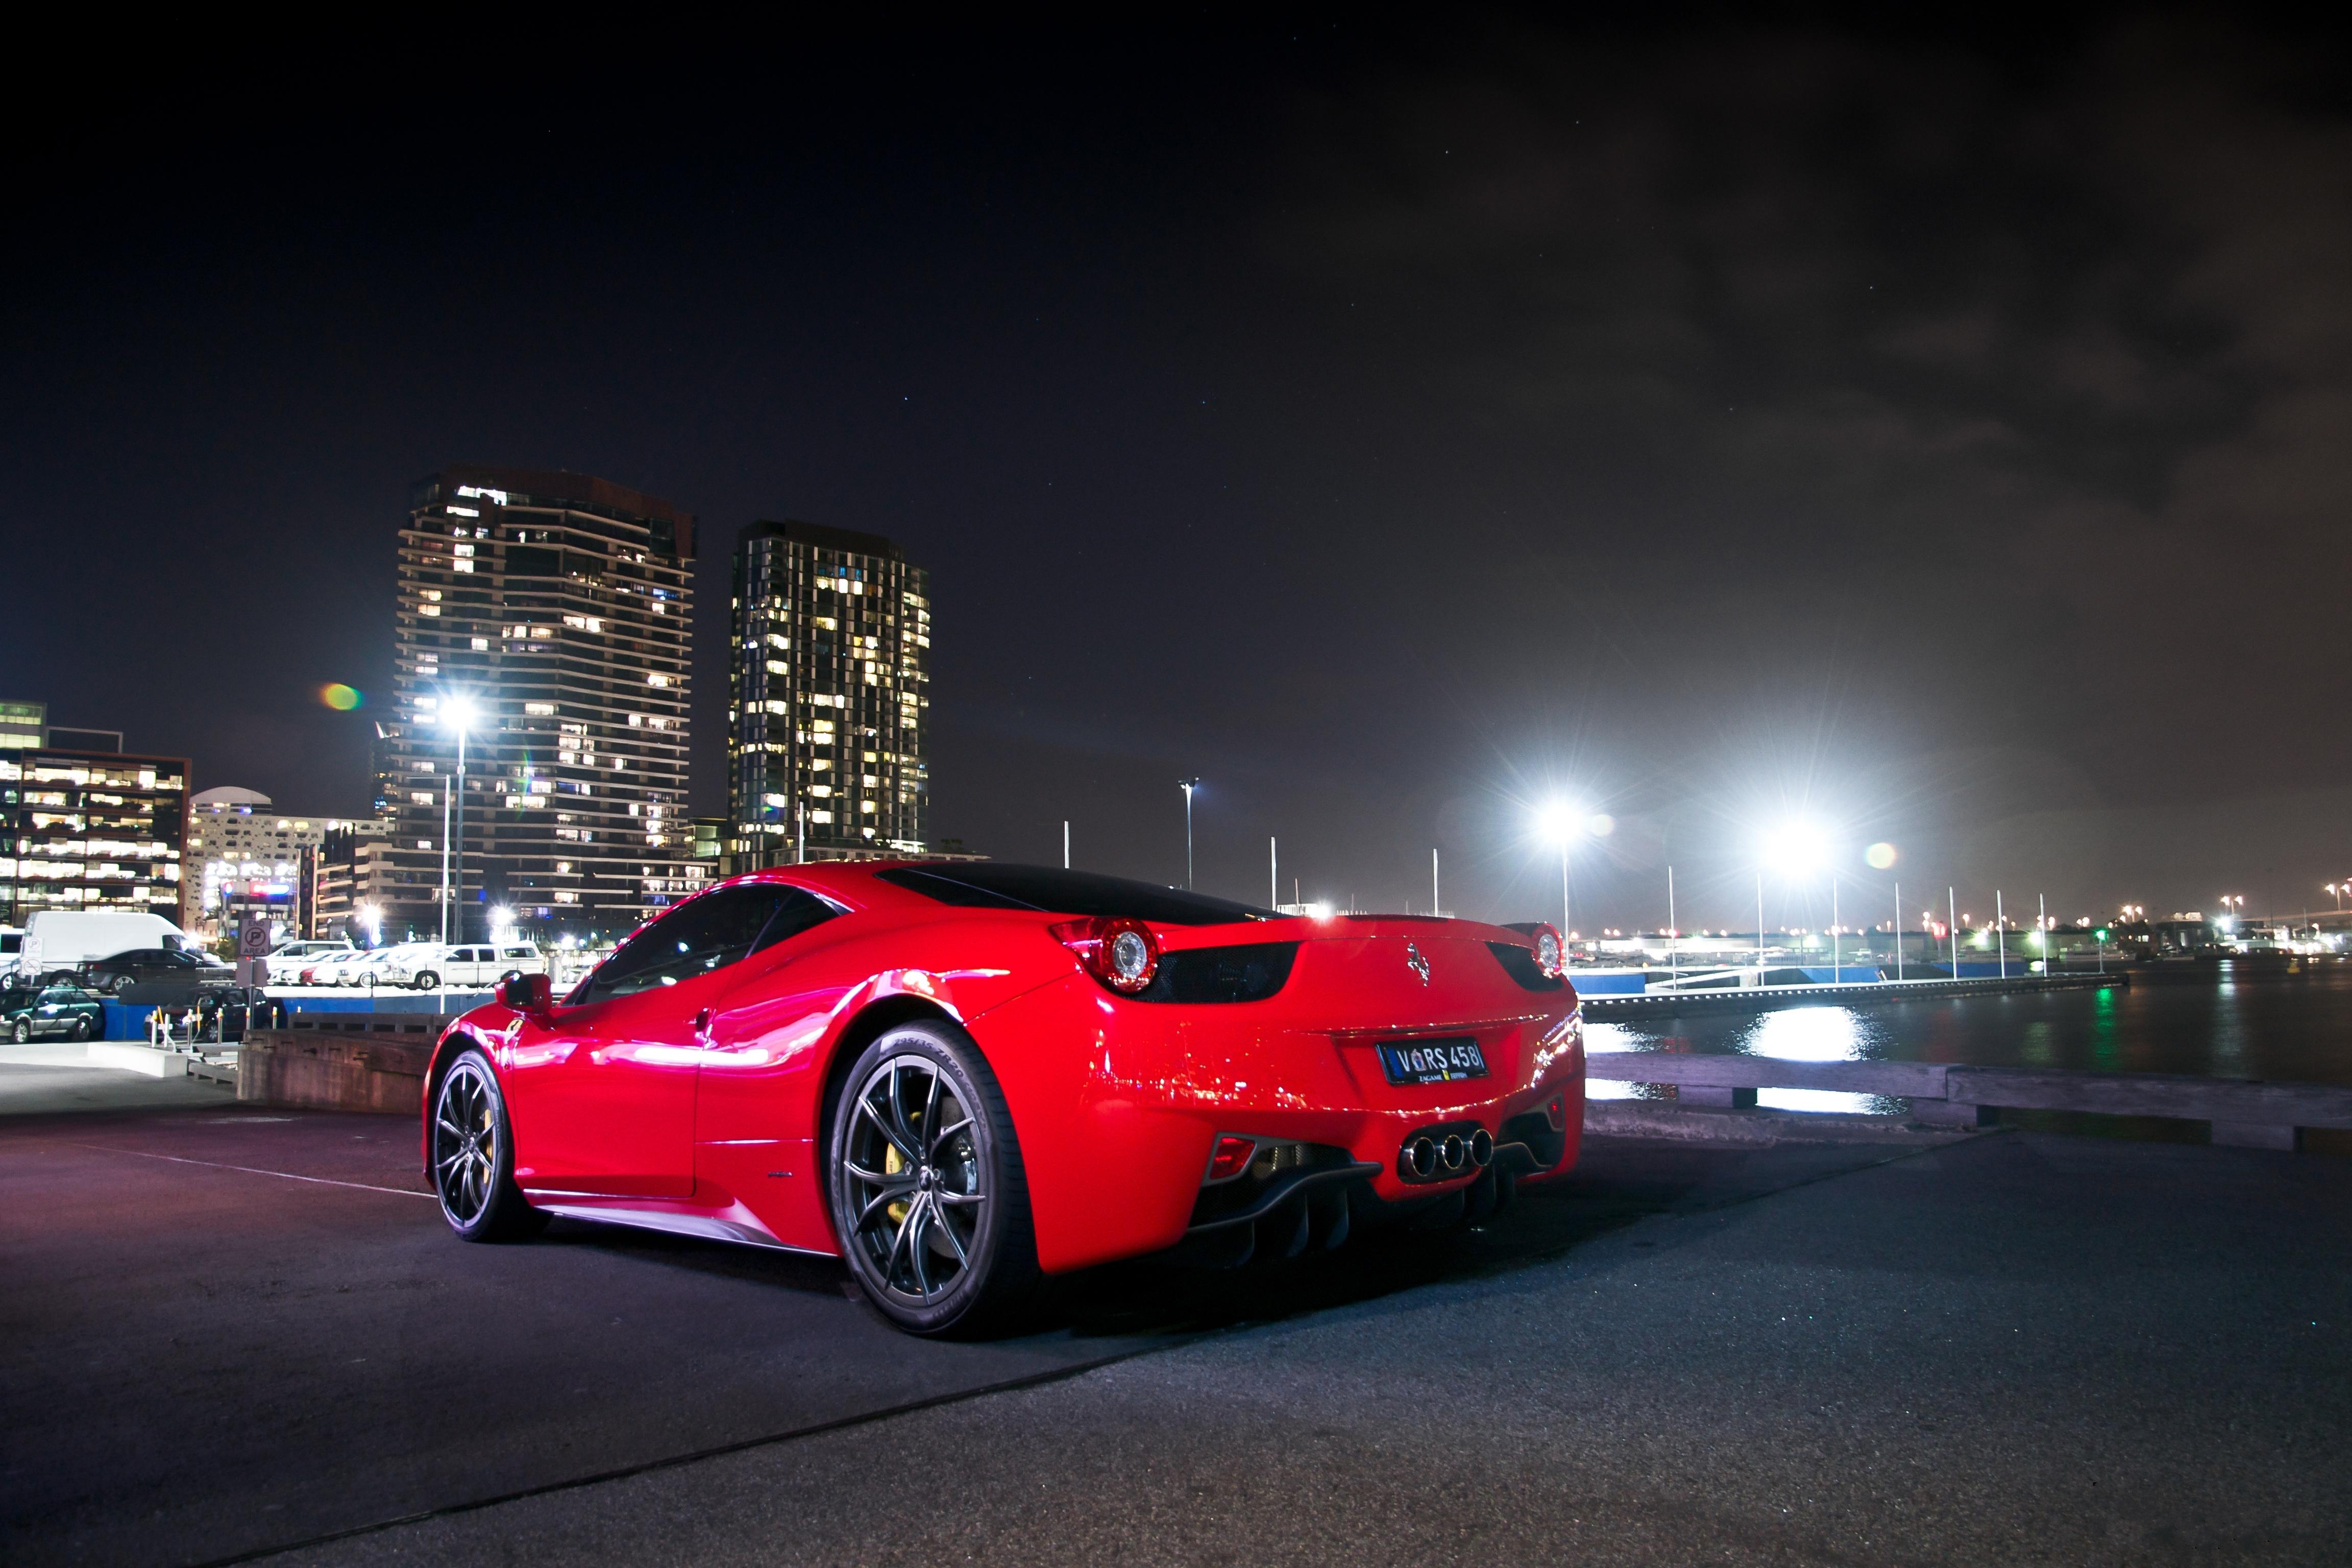 Get Ferrari Wallpaper 1456 X 2592  Background